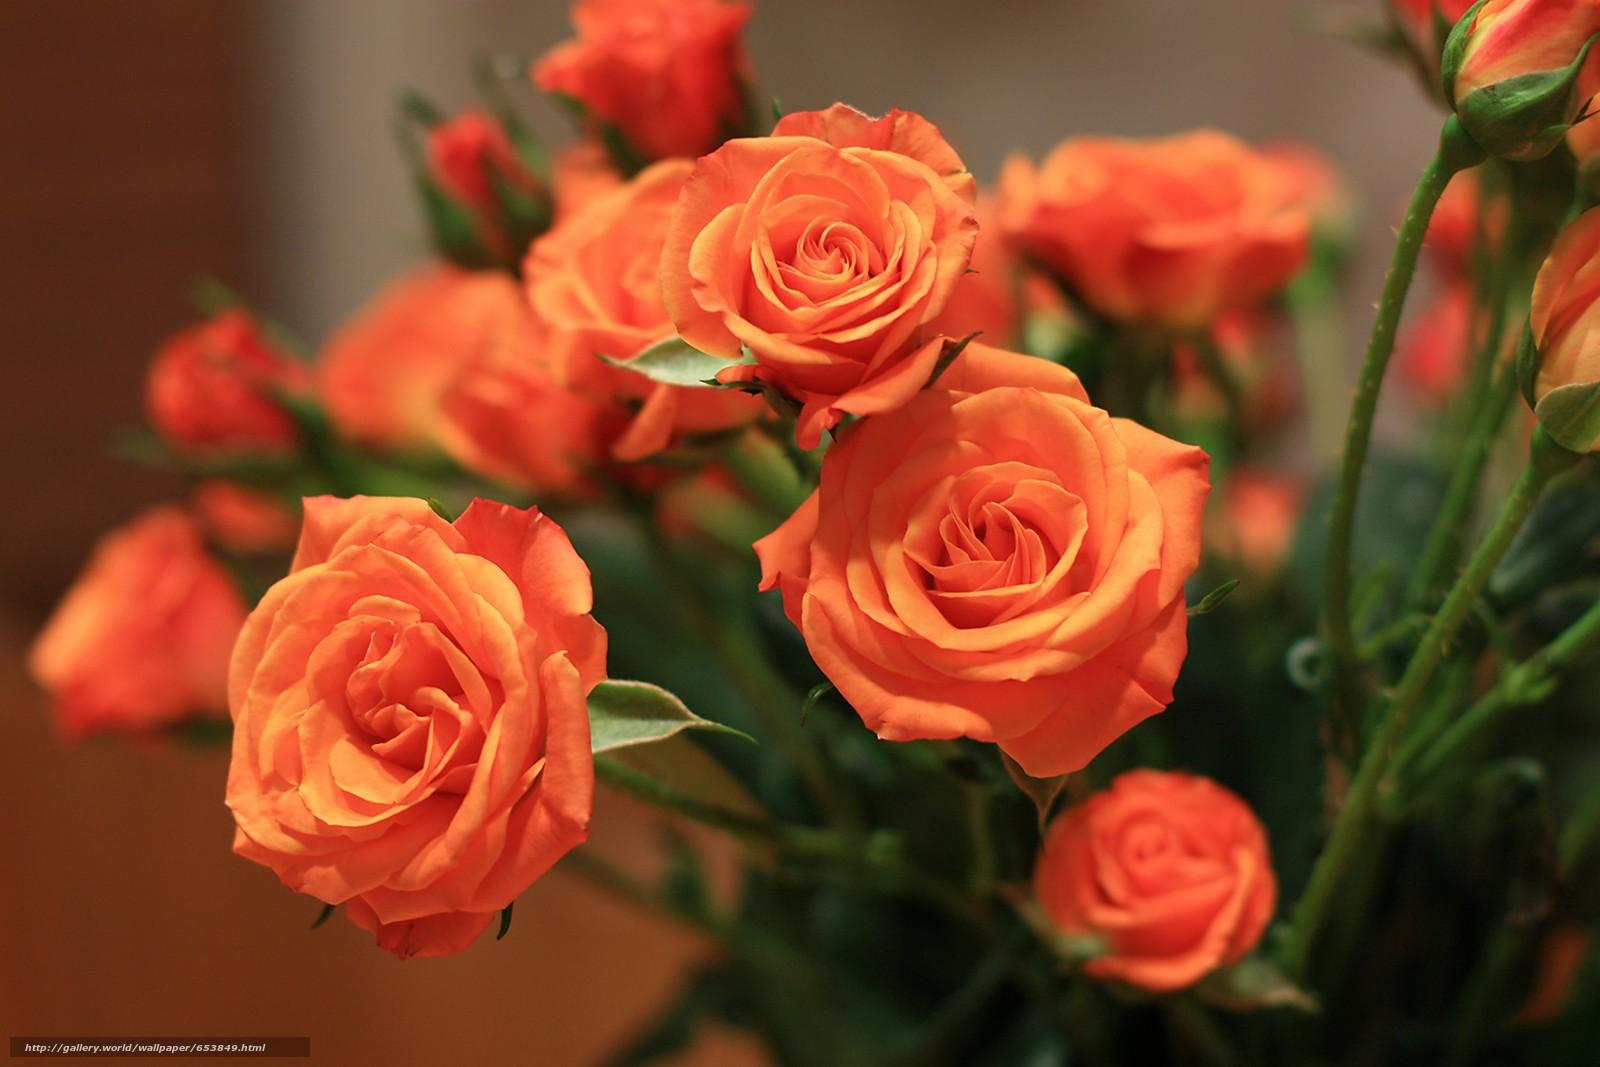 Download wallpaper Roses,  Flowers,  flower,  Macro free desktop wallpaper in the resolution 4122x2748 — picture №653849